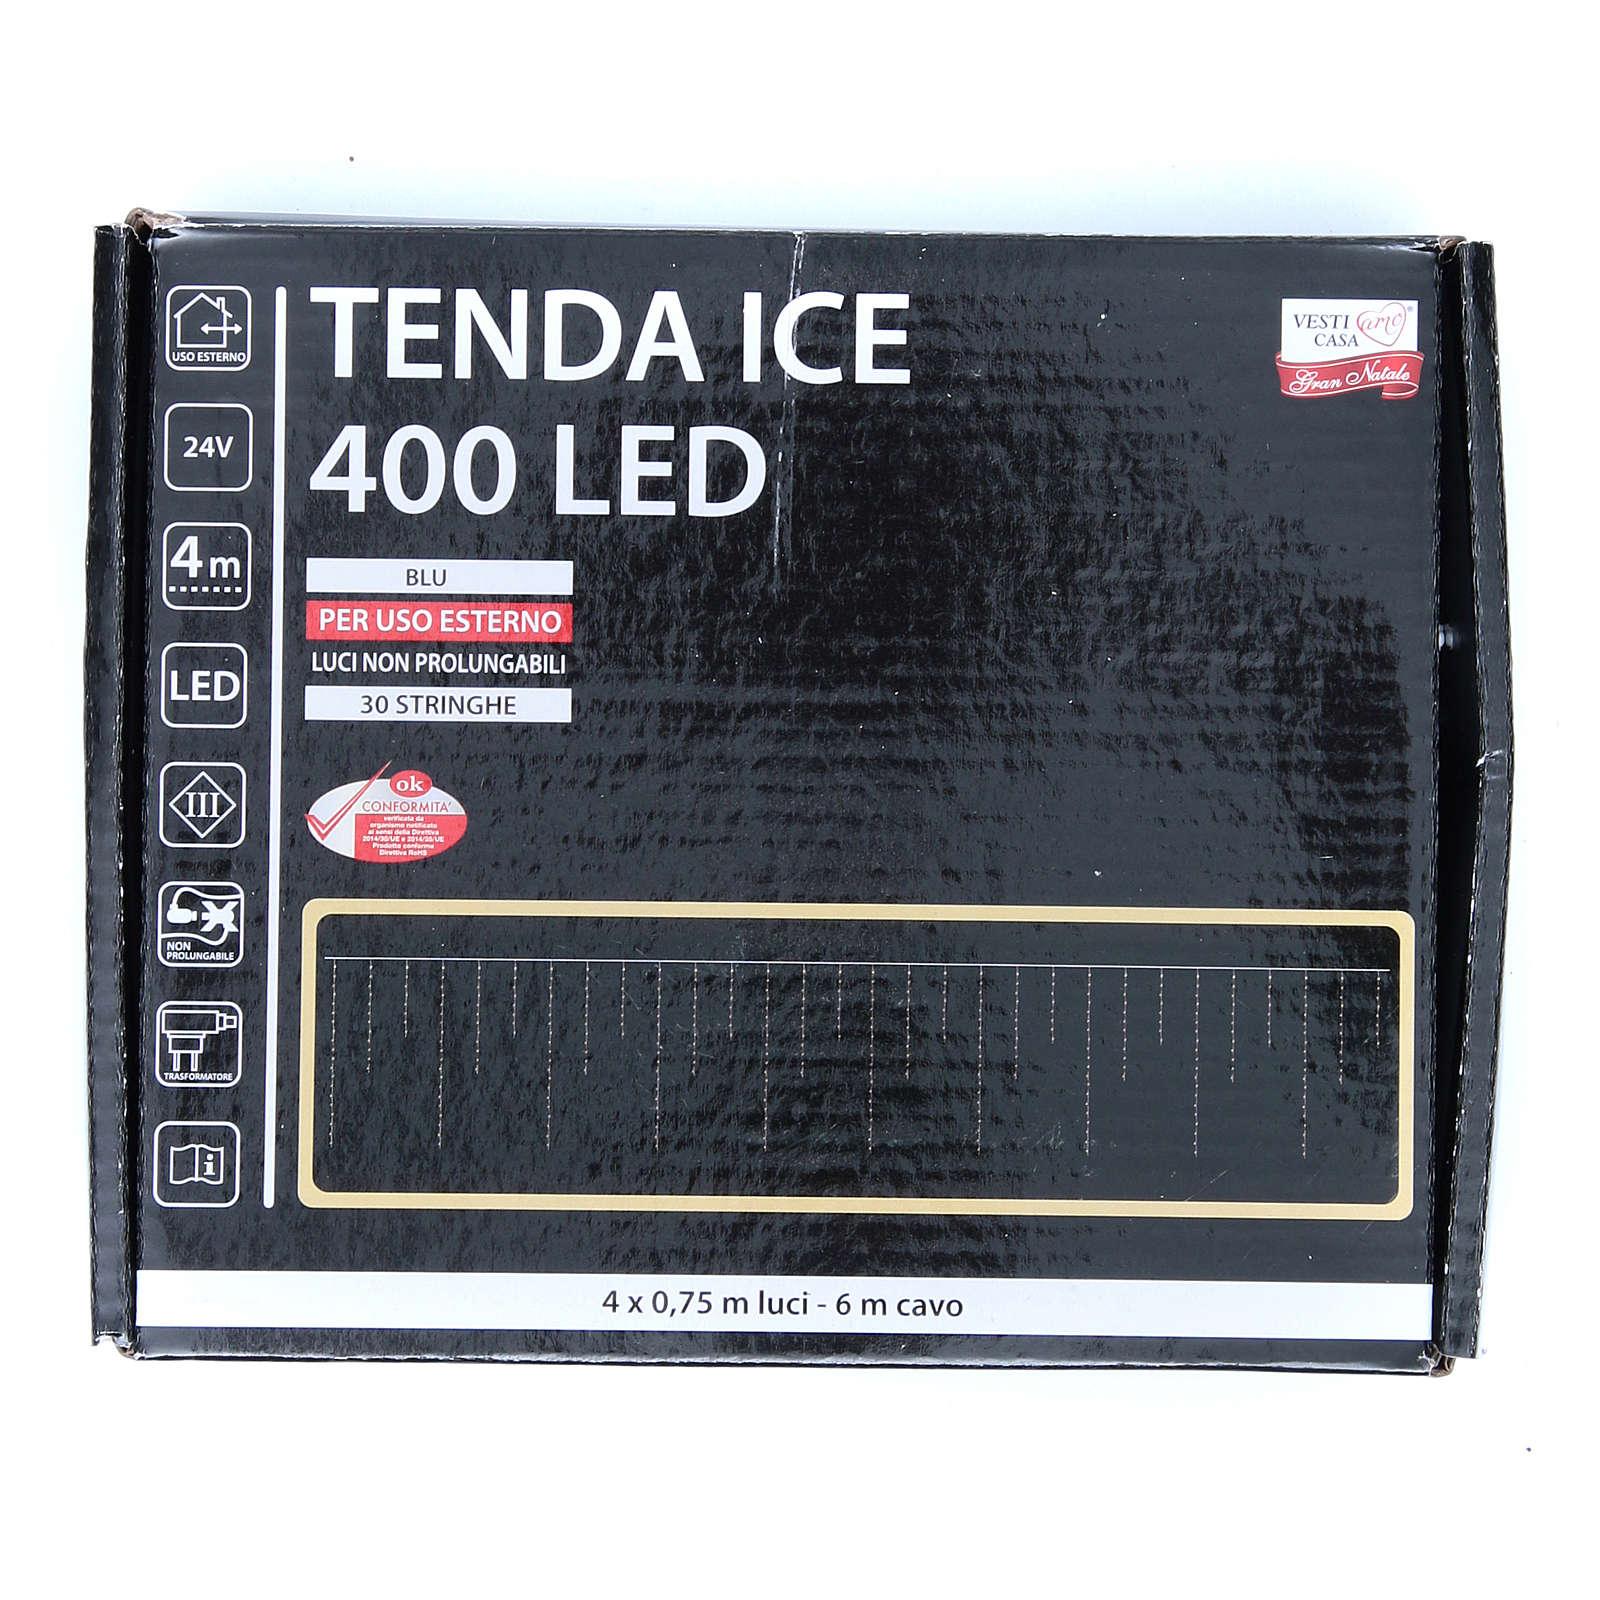 Luce natalizia tenda ICE 400 led blu ESTERNO 3